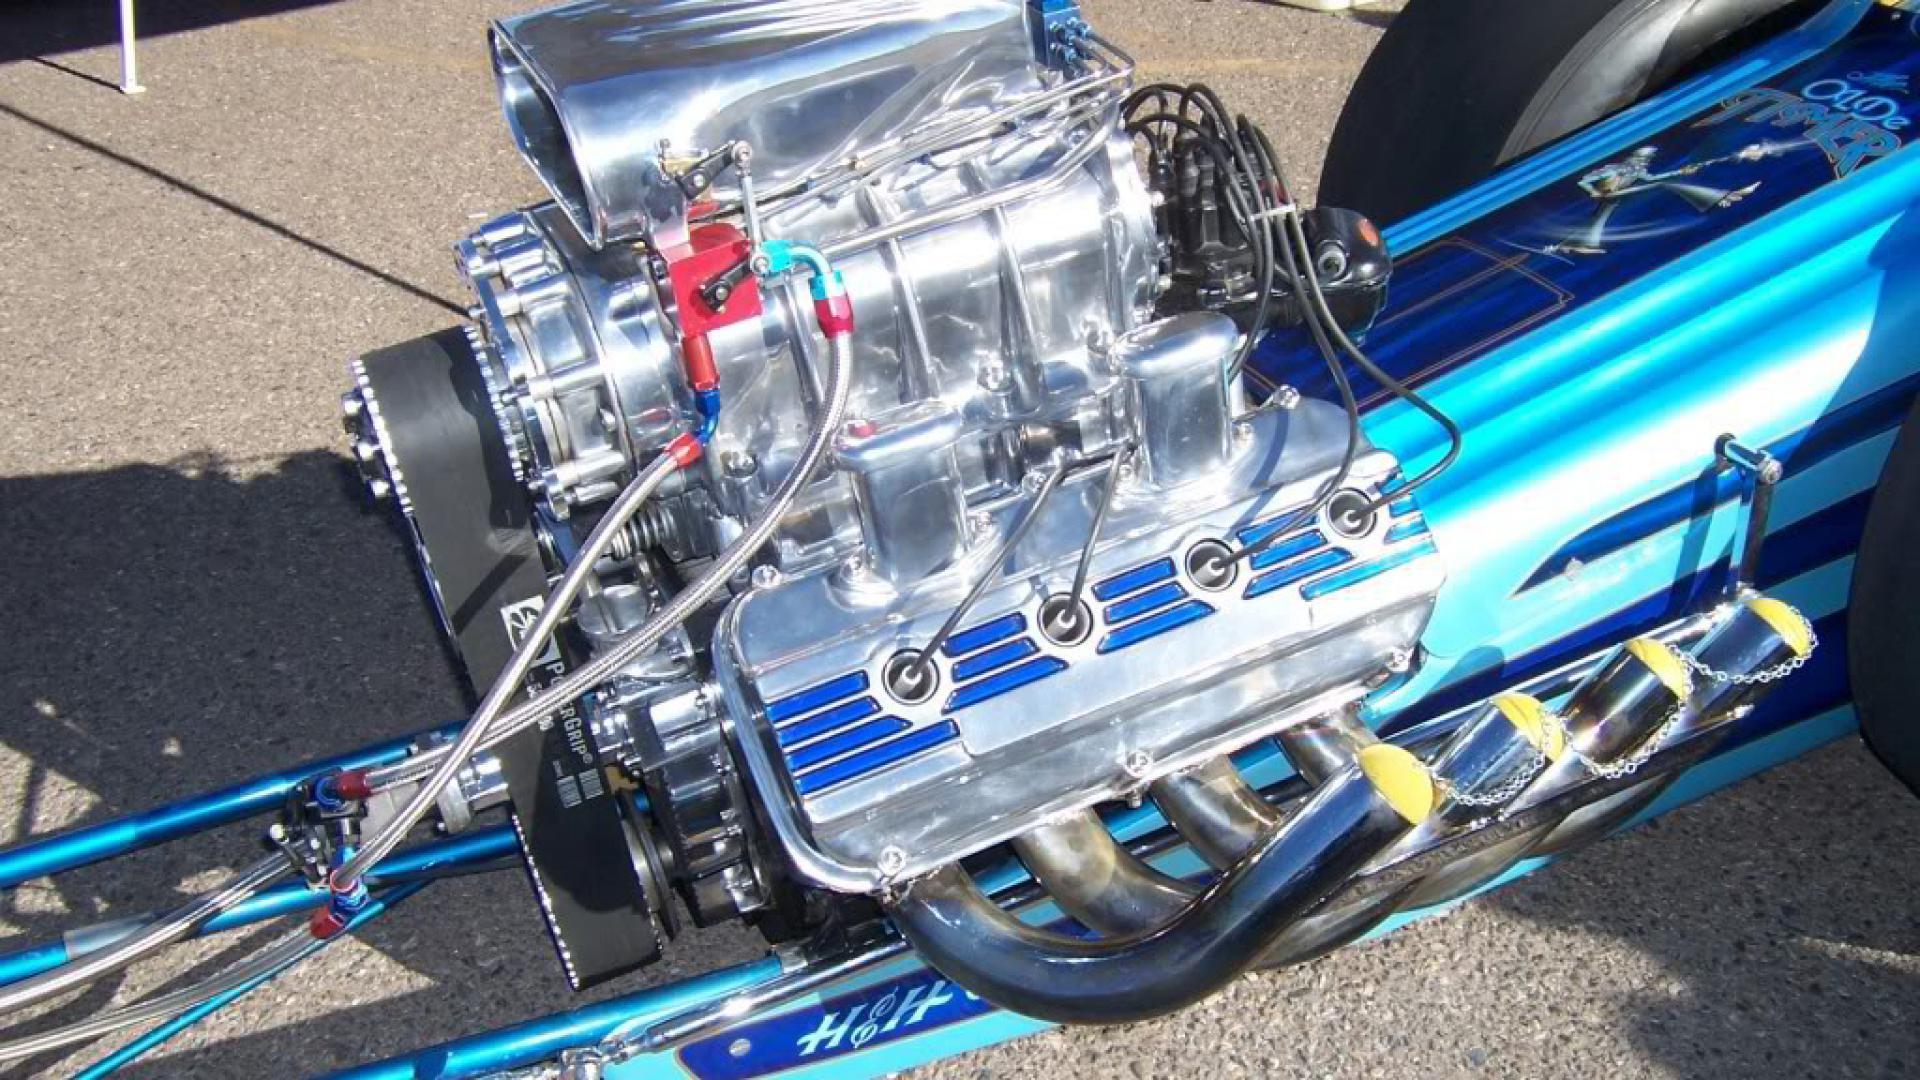 dragster-engine.jpg